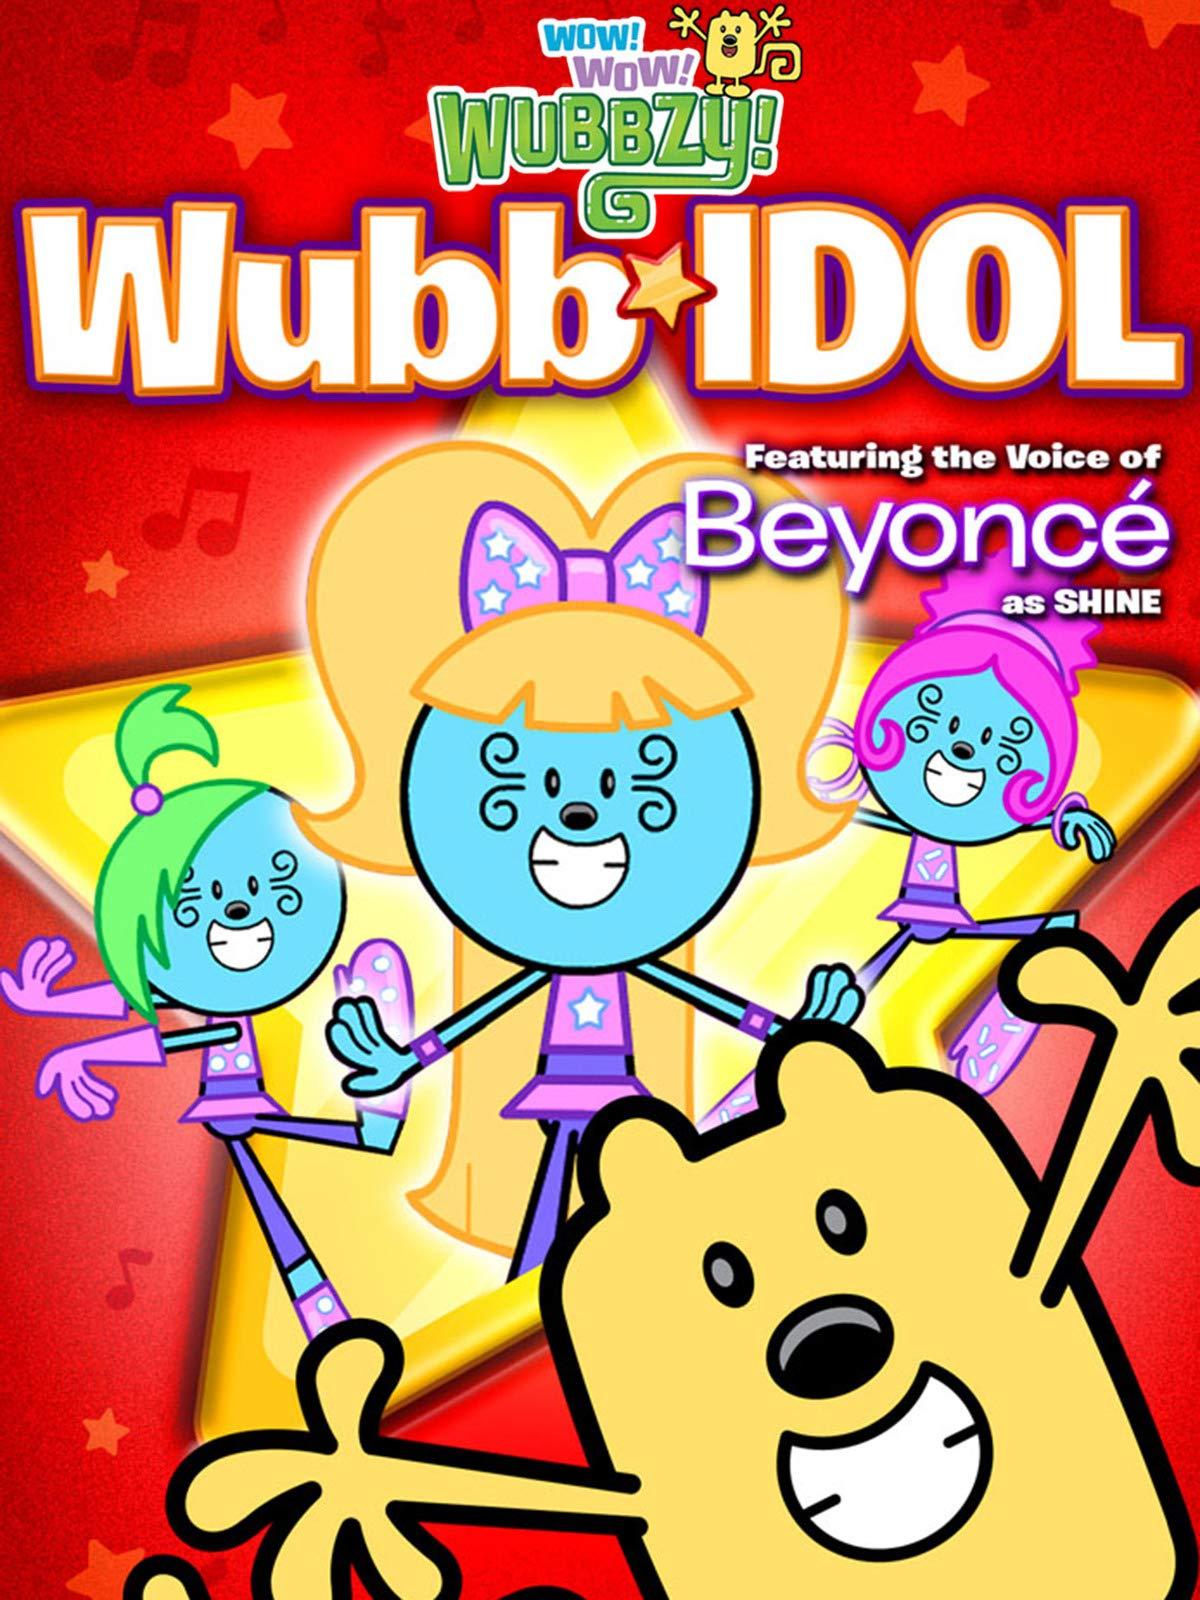 Wow! Wow! Wubbzy!: Wubb Idol on Amazon Prime Instant Video UK